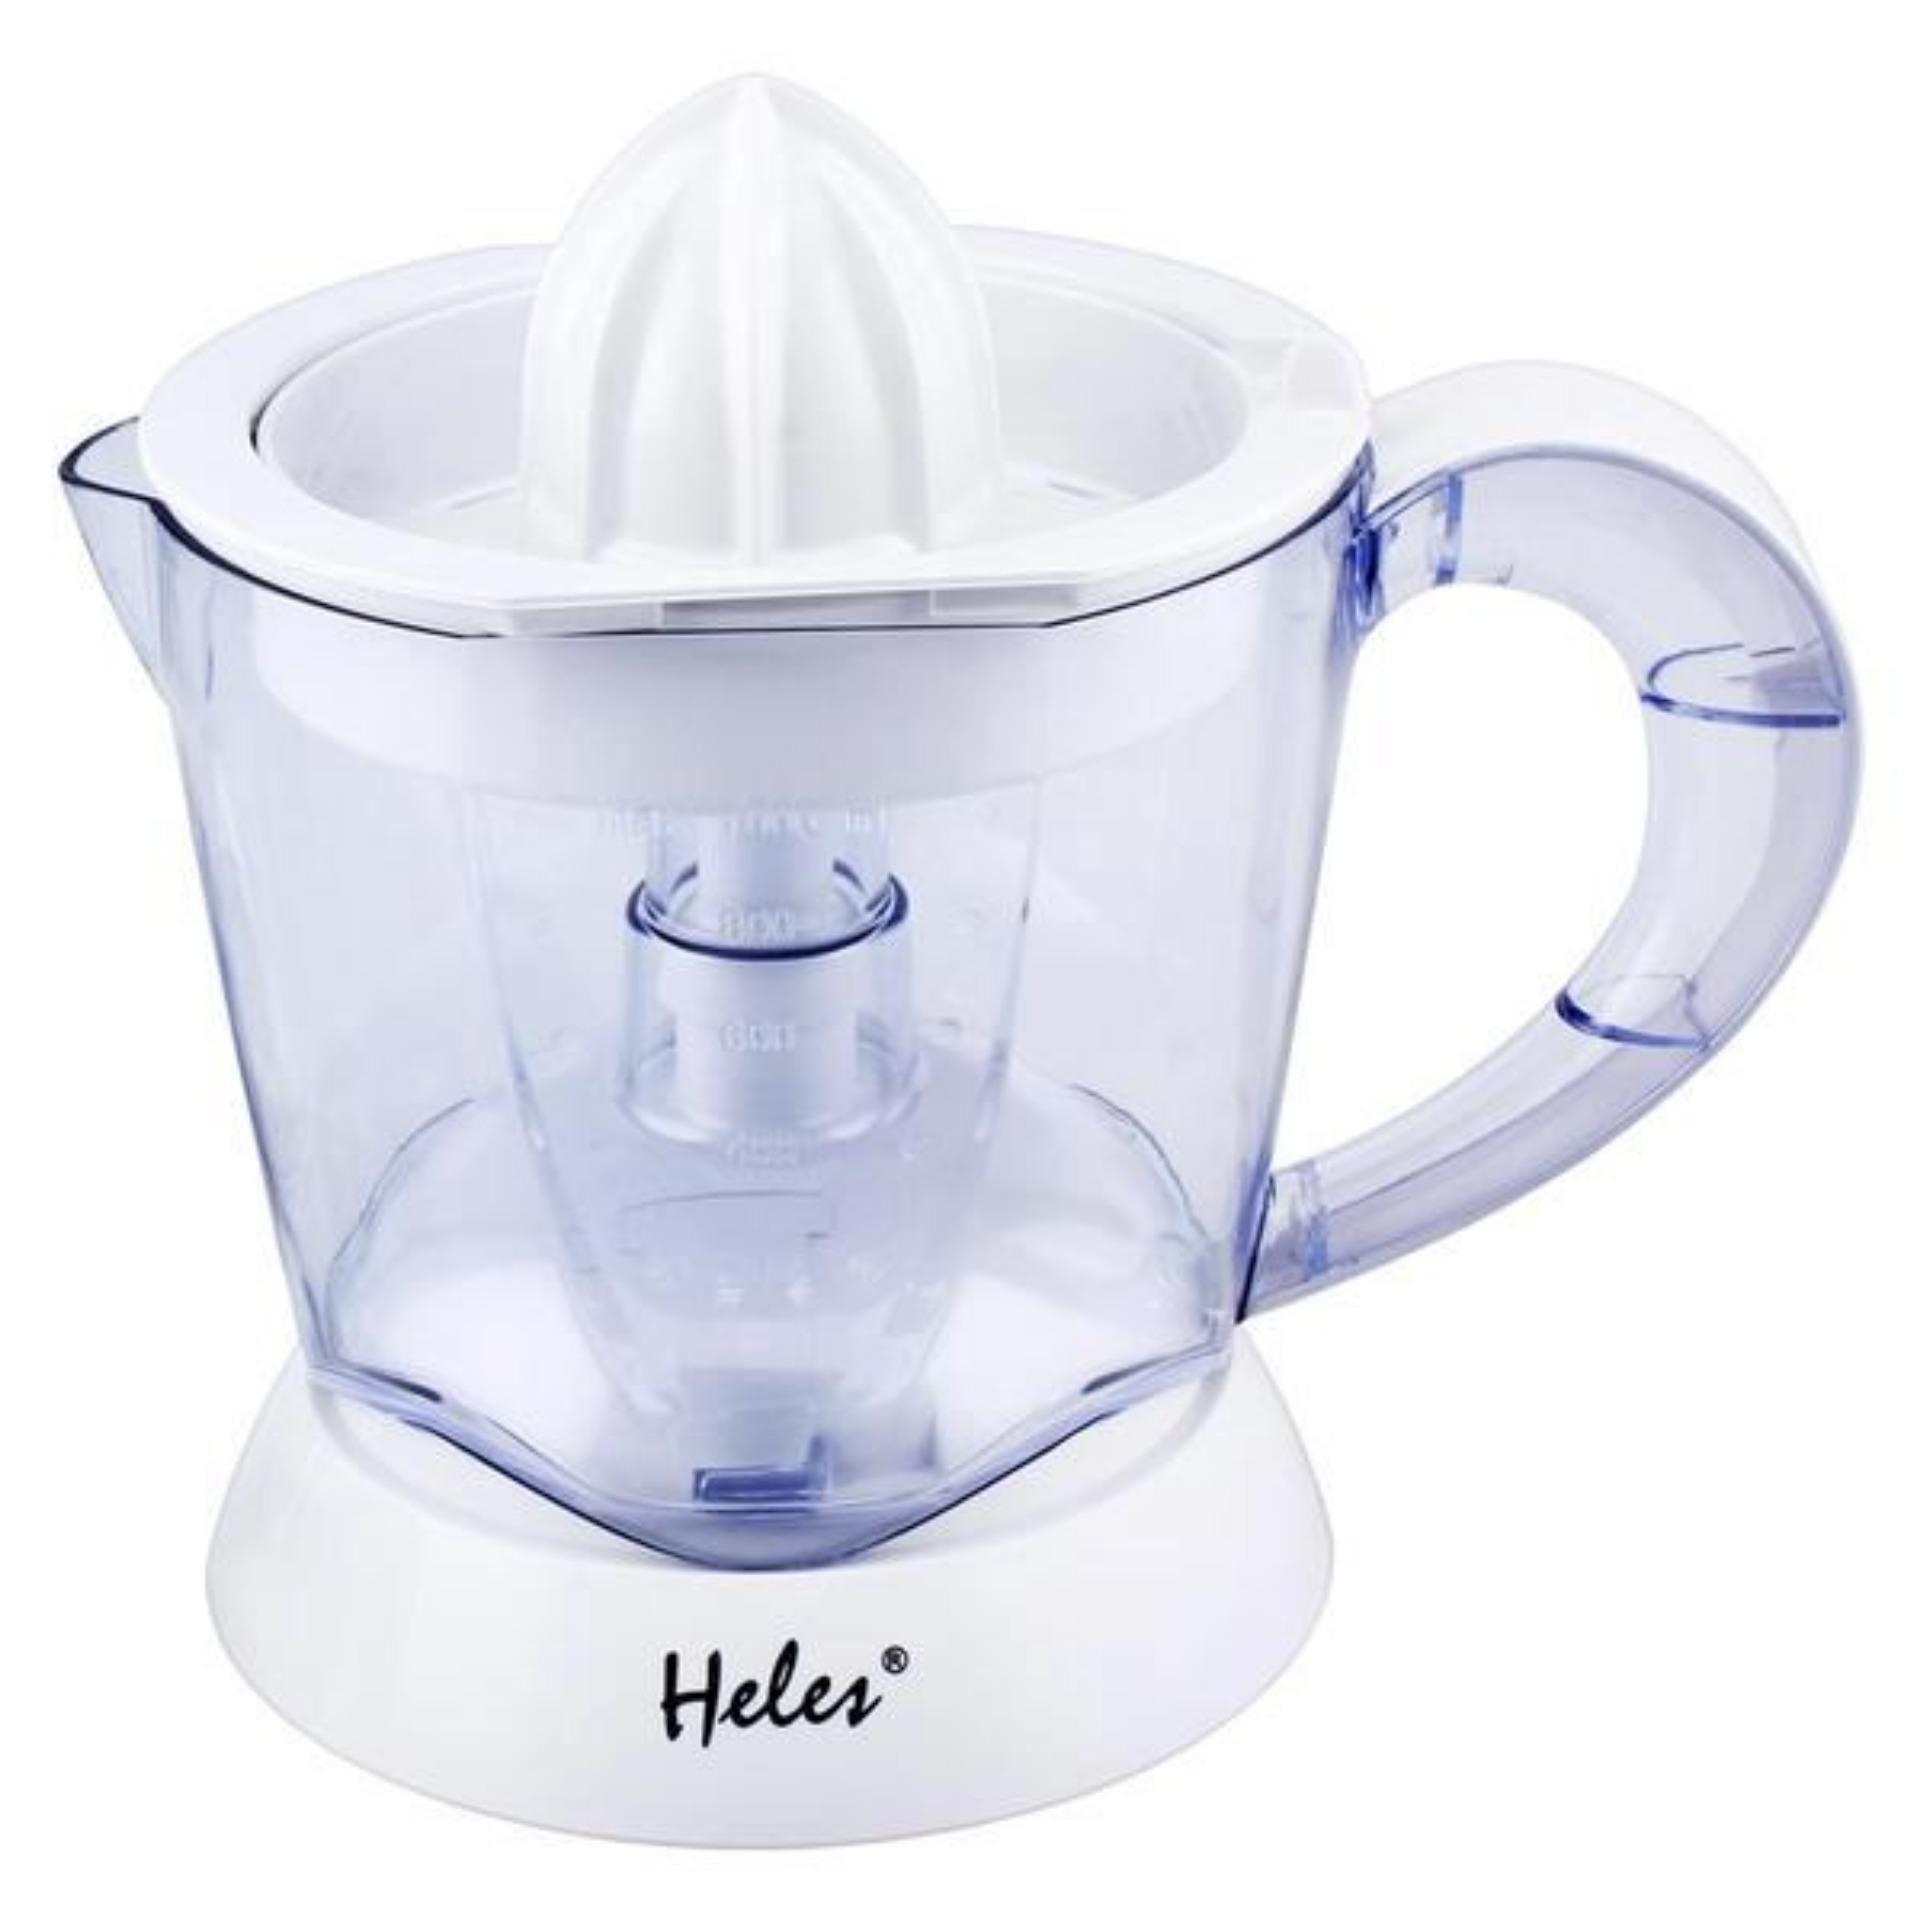 Beli Barang Heles Citrus Juicer Hl 151 Alat Peras Jeruk White Online